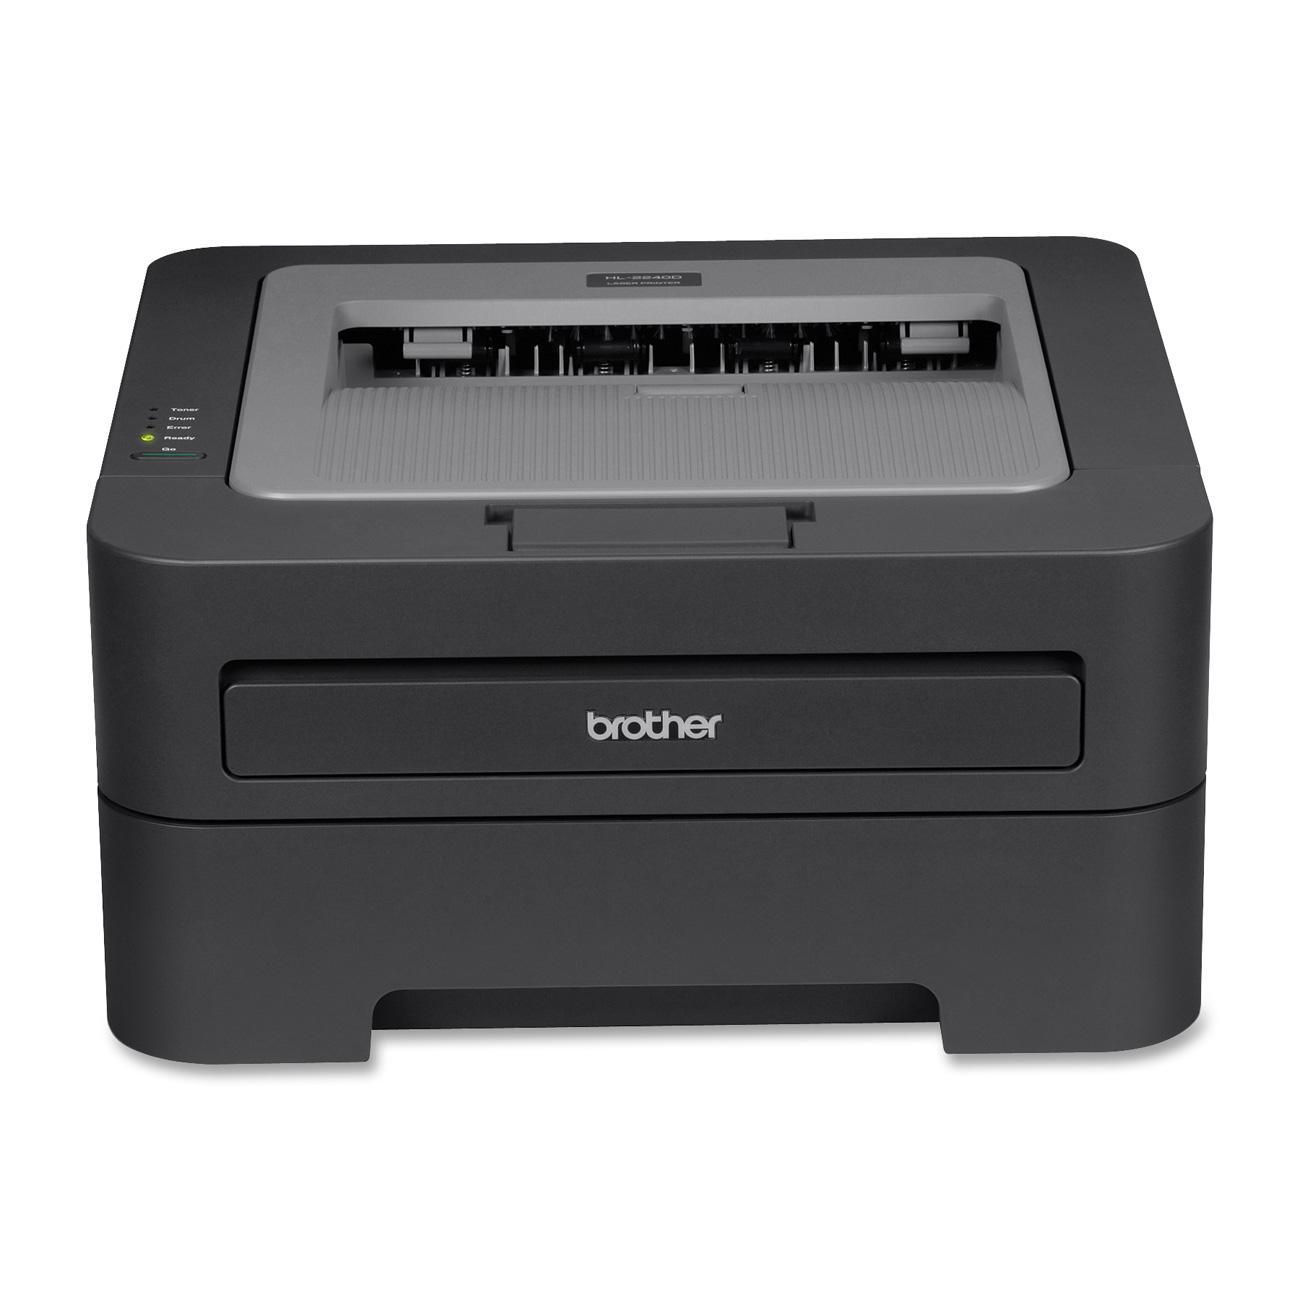 Brother HL-2240 Laser Printer - Monochrome - 2400 x 600 dpi Print - Plain Paper Print - Desktop - 24 ppm Mono Print - 251 sheets Standard Input Capacity - 10000 Duty Cycle - Manual Duplex Print - USB 0